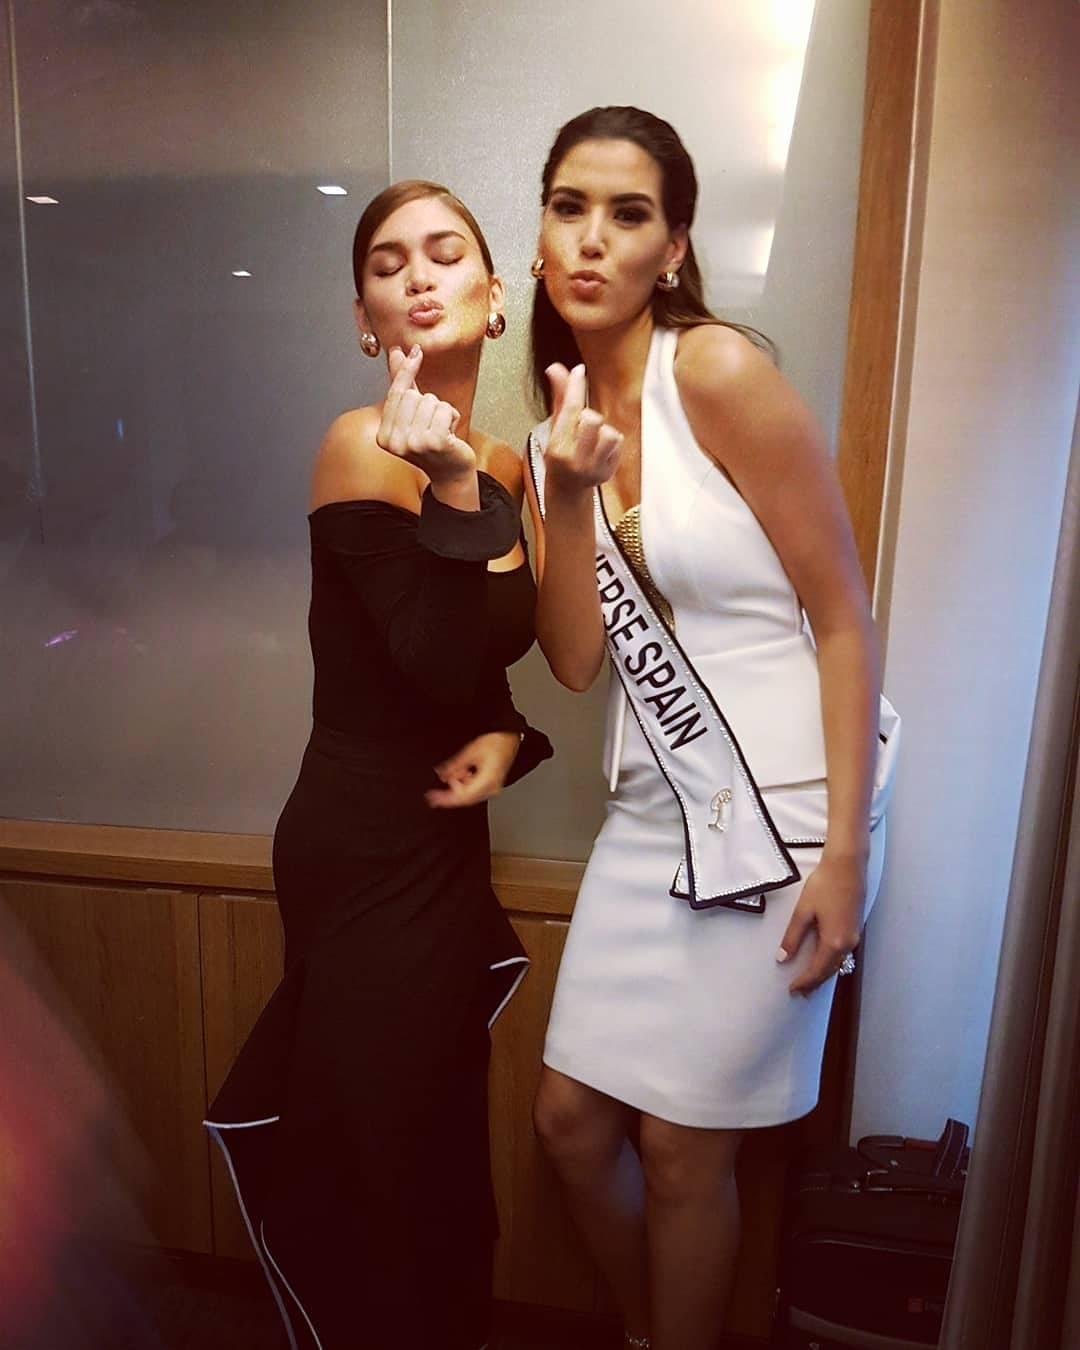 sofia del prado, reyna hispanoamericana 2015, top 10 de miss universe 2017. - Página 13 25009610